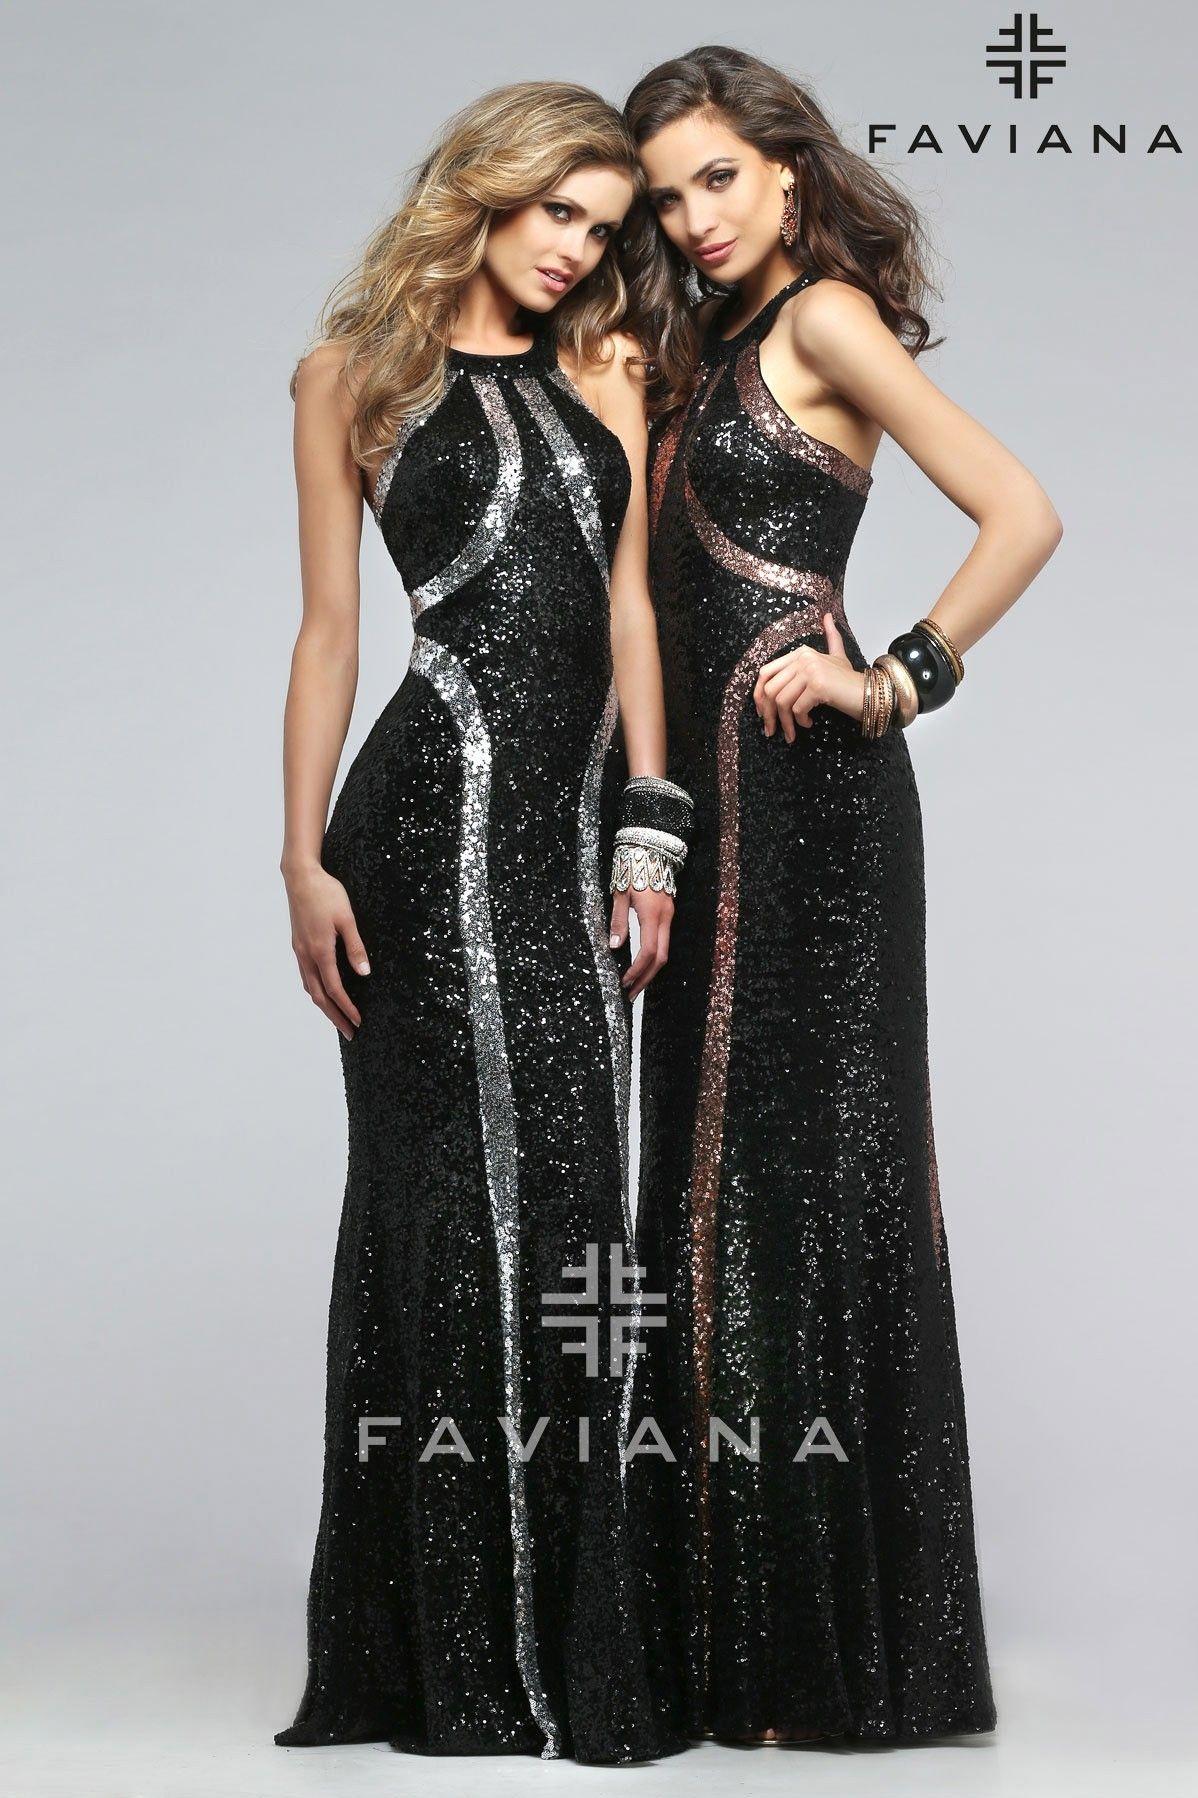 Faviana Dress Black and Copper